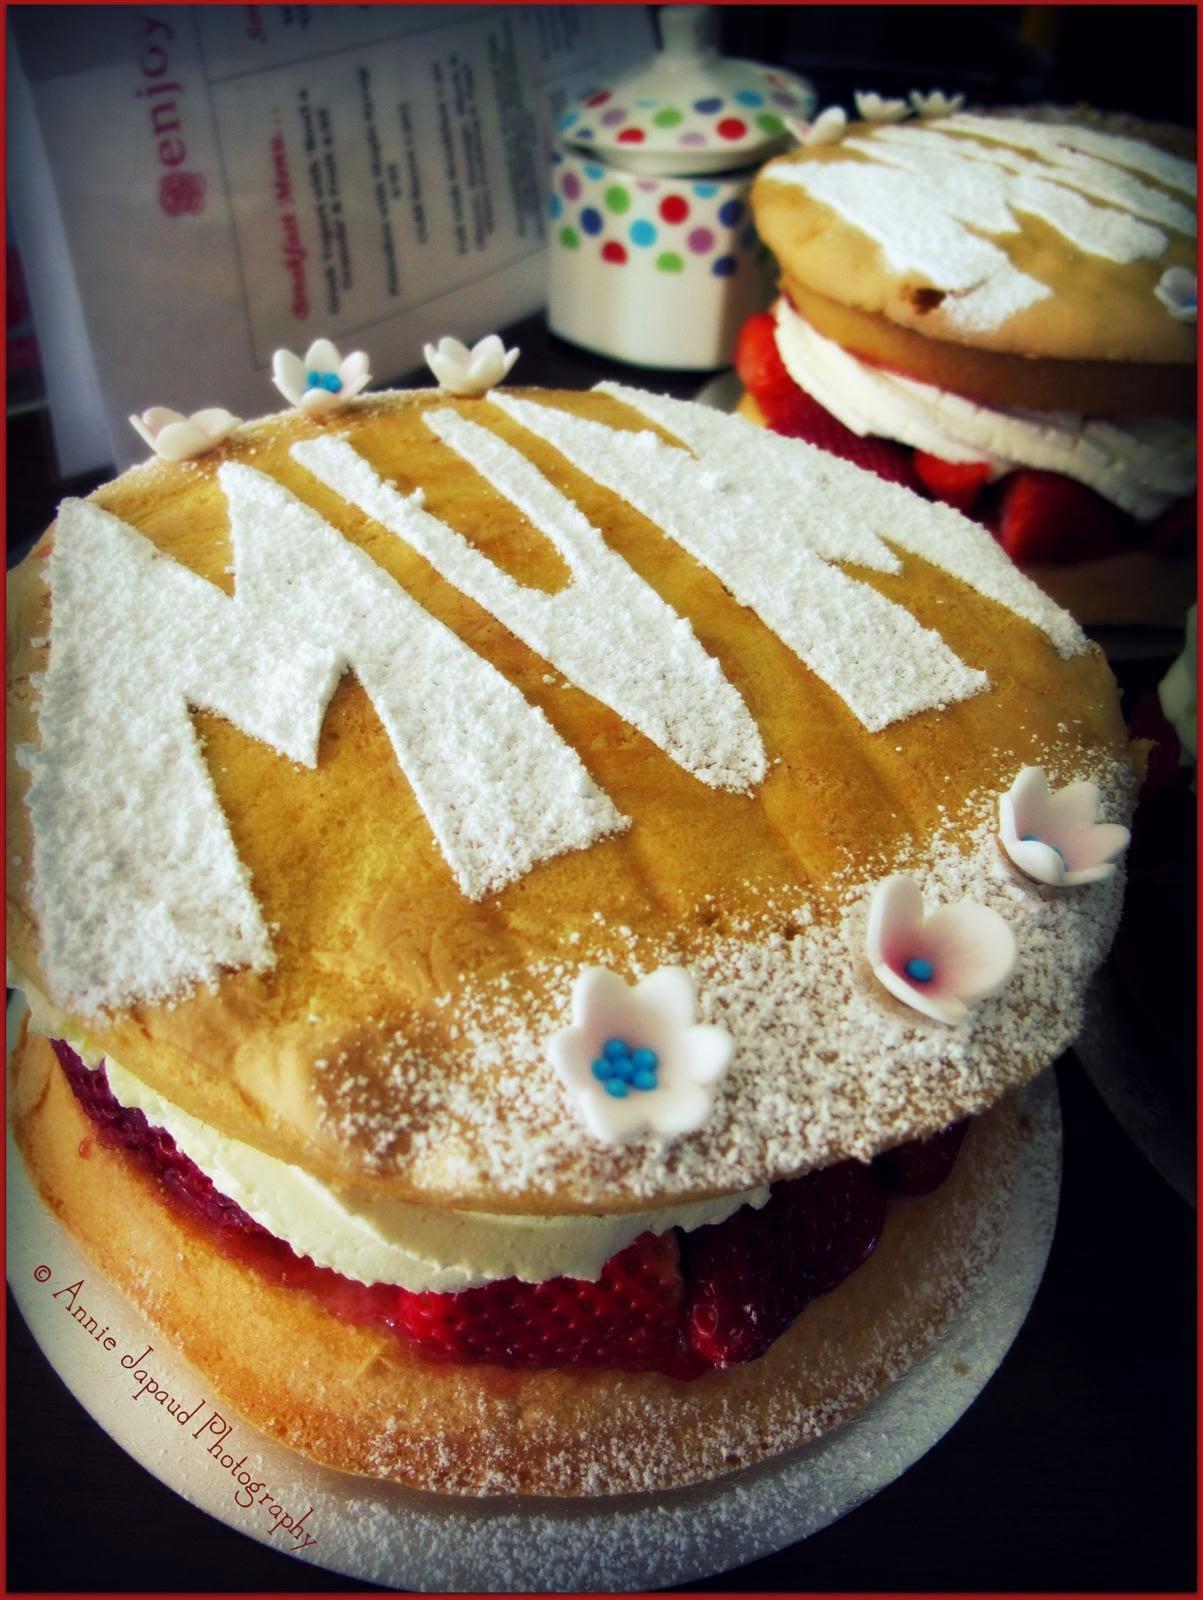 Victoria sponge cake up close